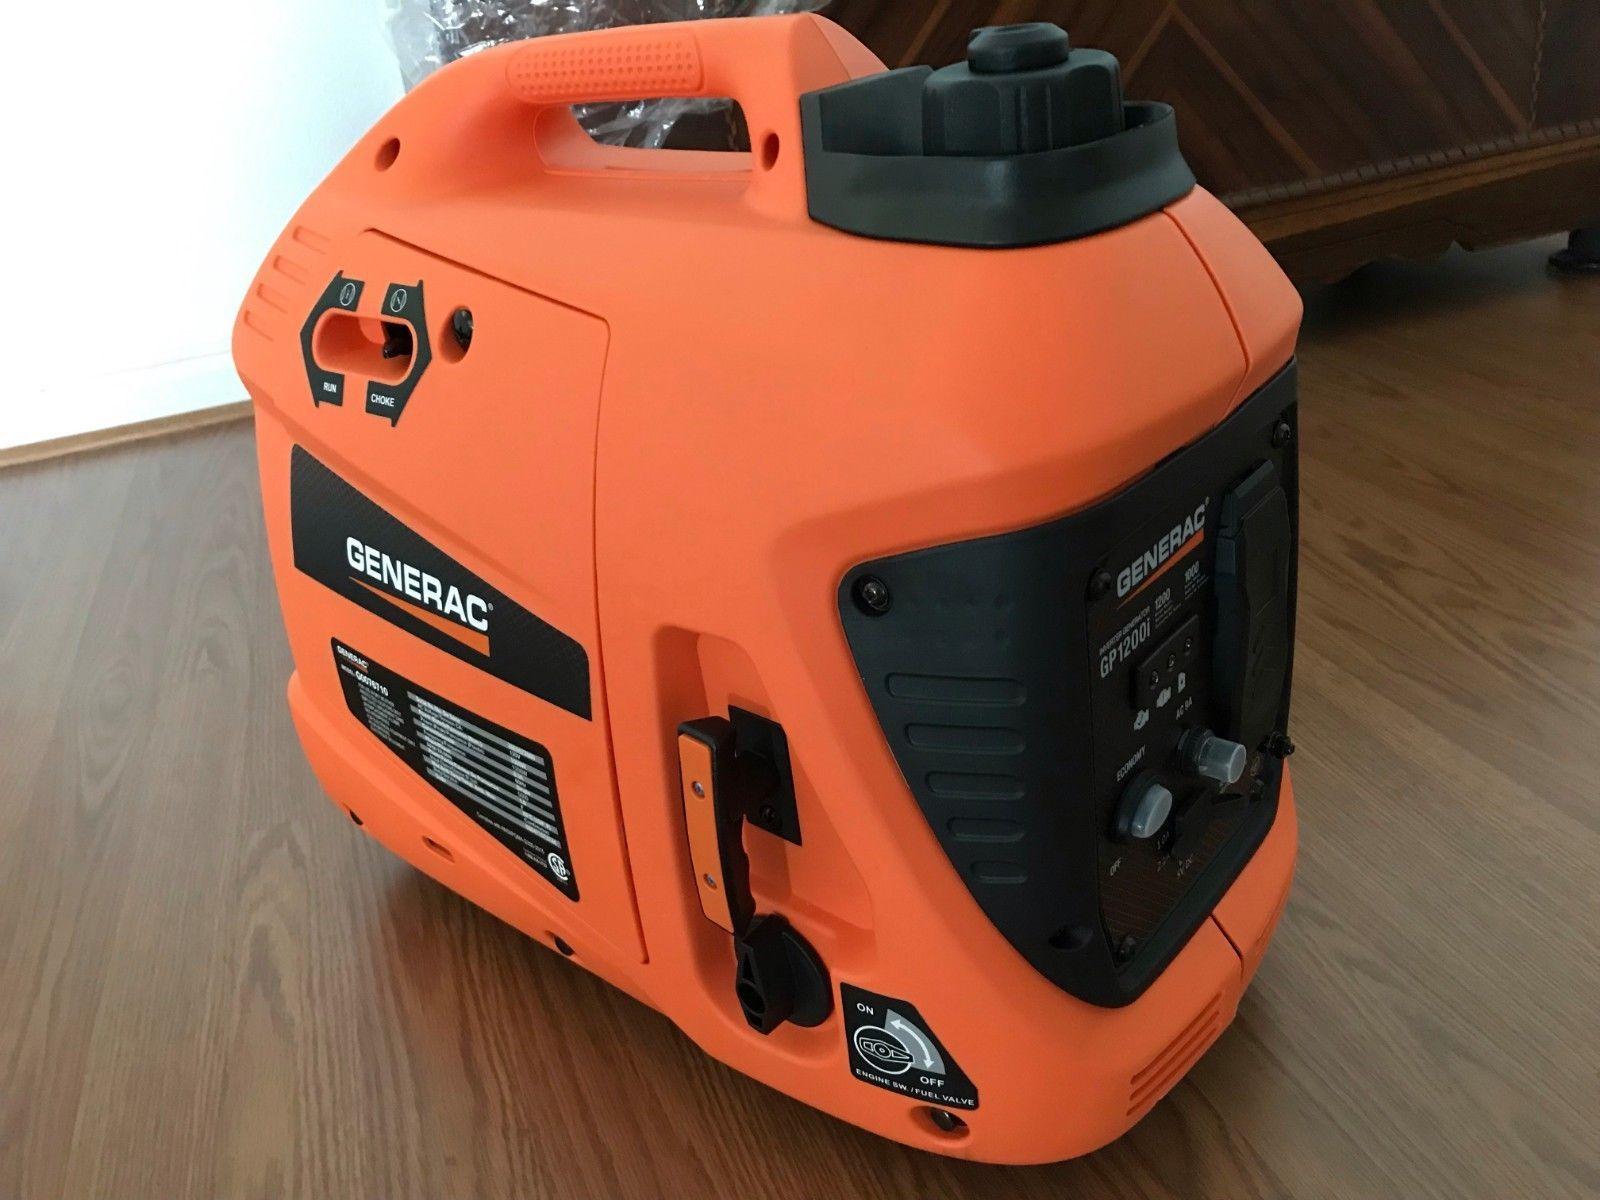 Generators 33082 Generac 1200w Inverter Generator Model G0076710 Brand New Never Used Buy It Now Only 210 On Ebay Generators Generation Model Brand